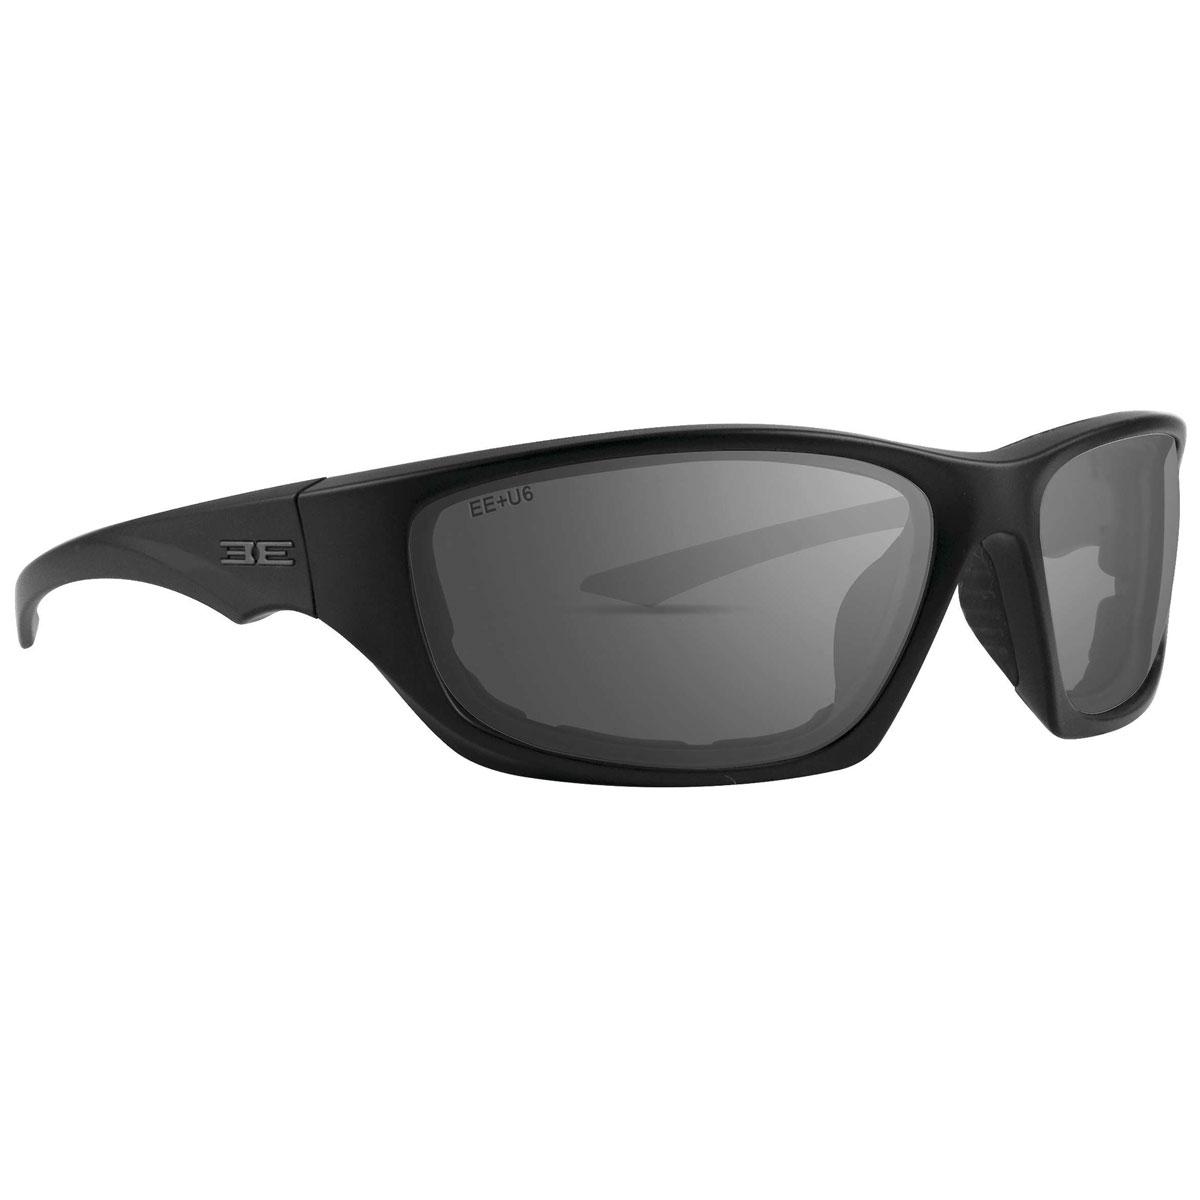 Epoch Eyewear Epoch Foam 3 Sunglasses with Smoke Lens